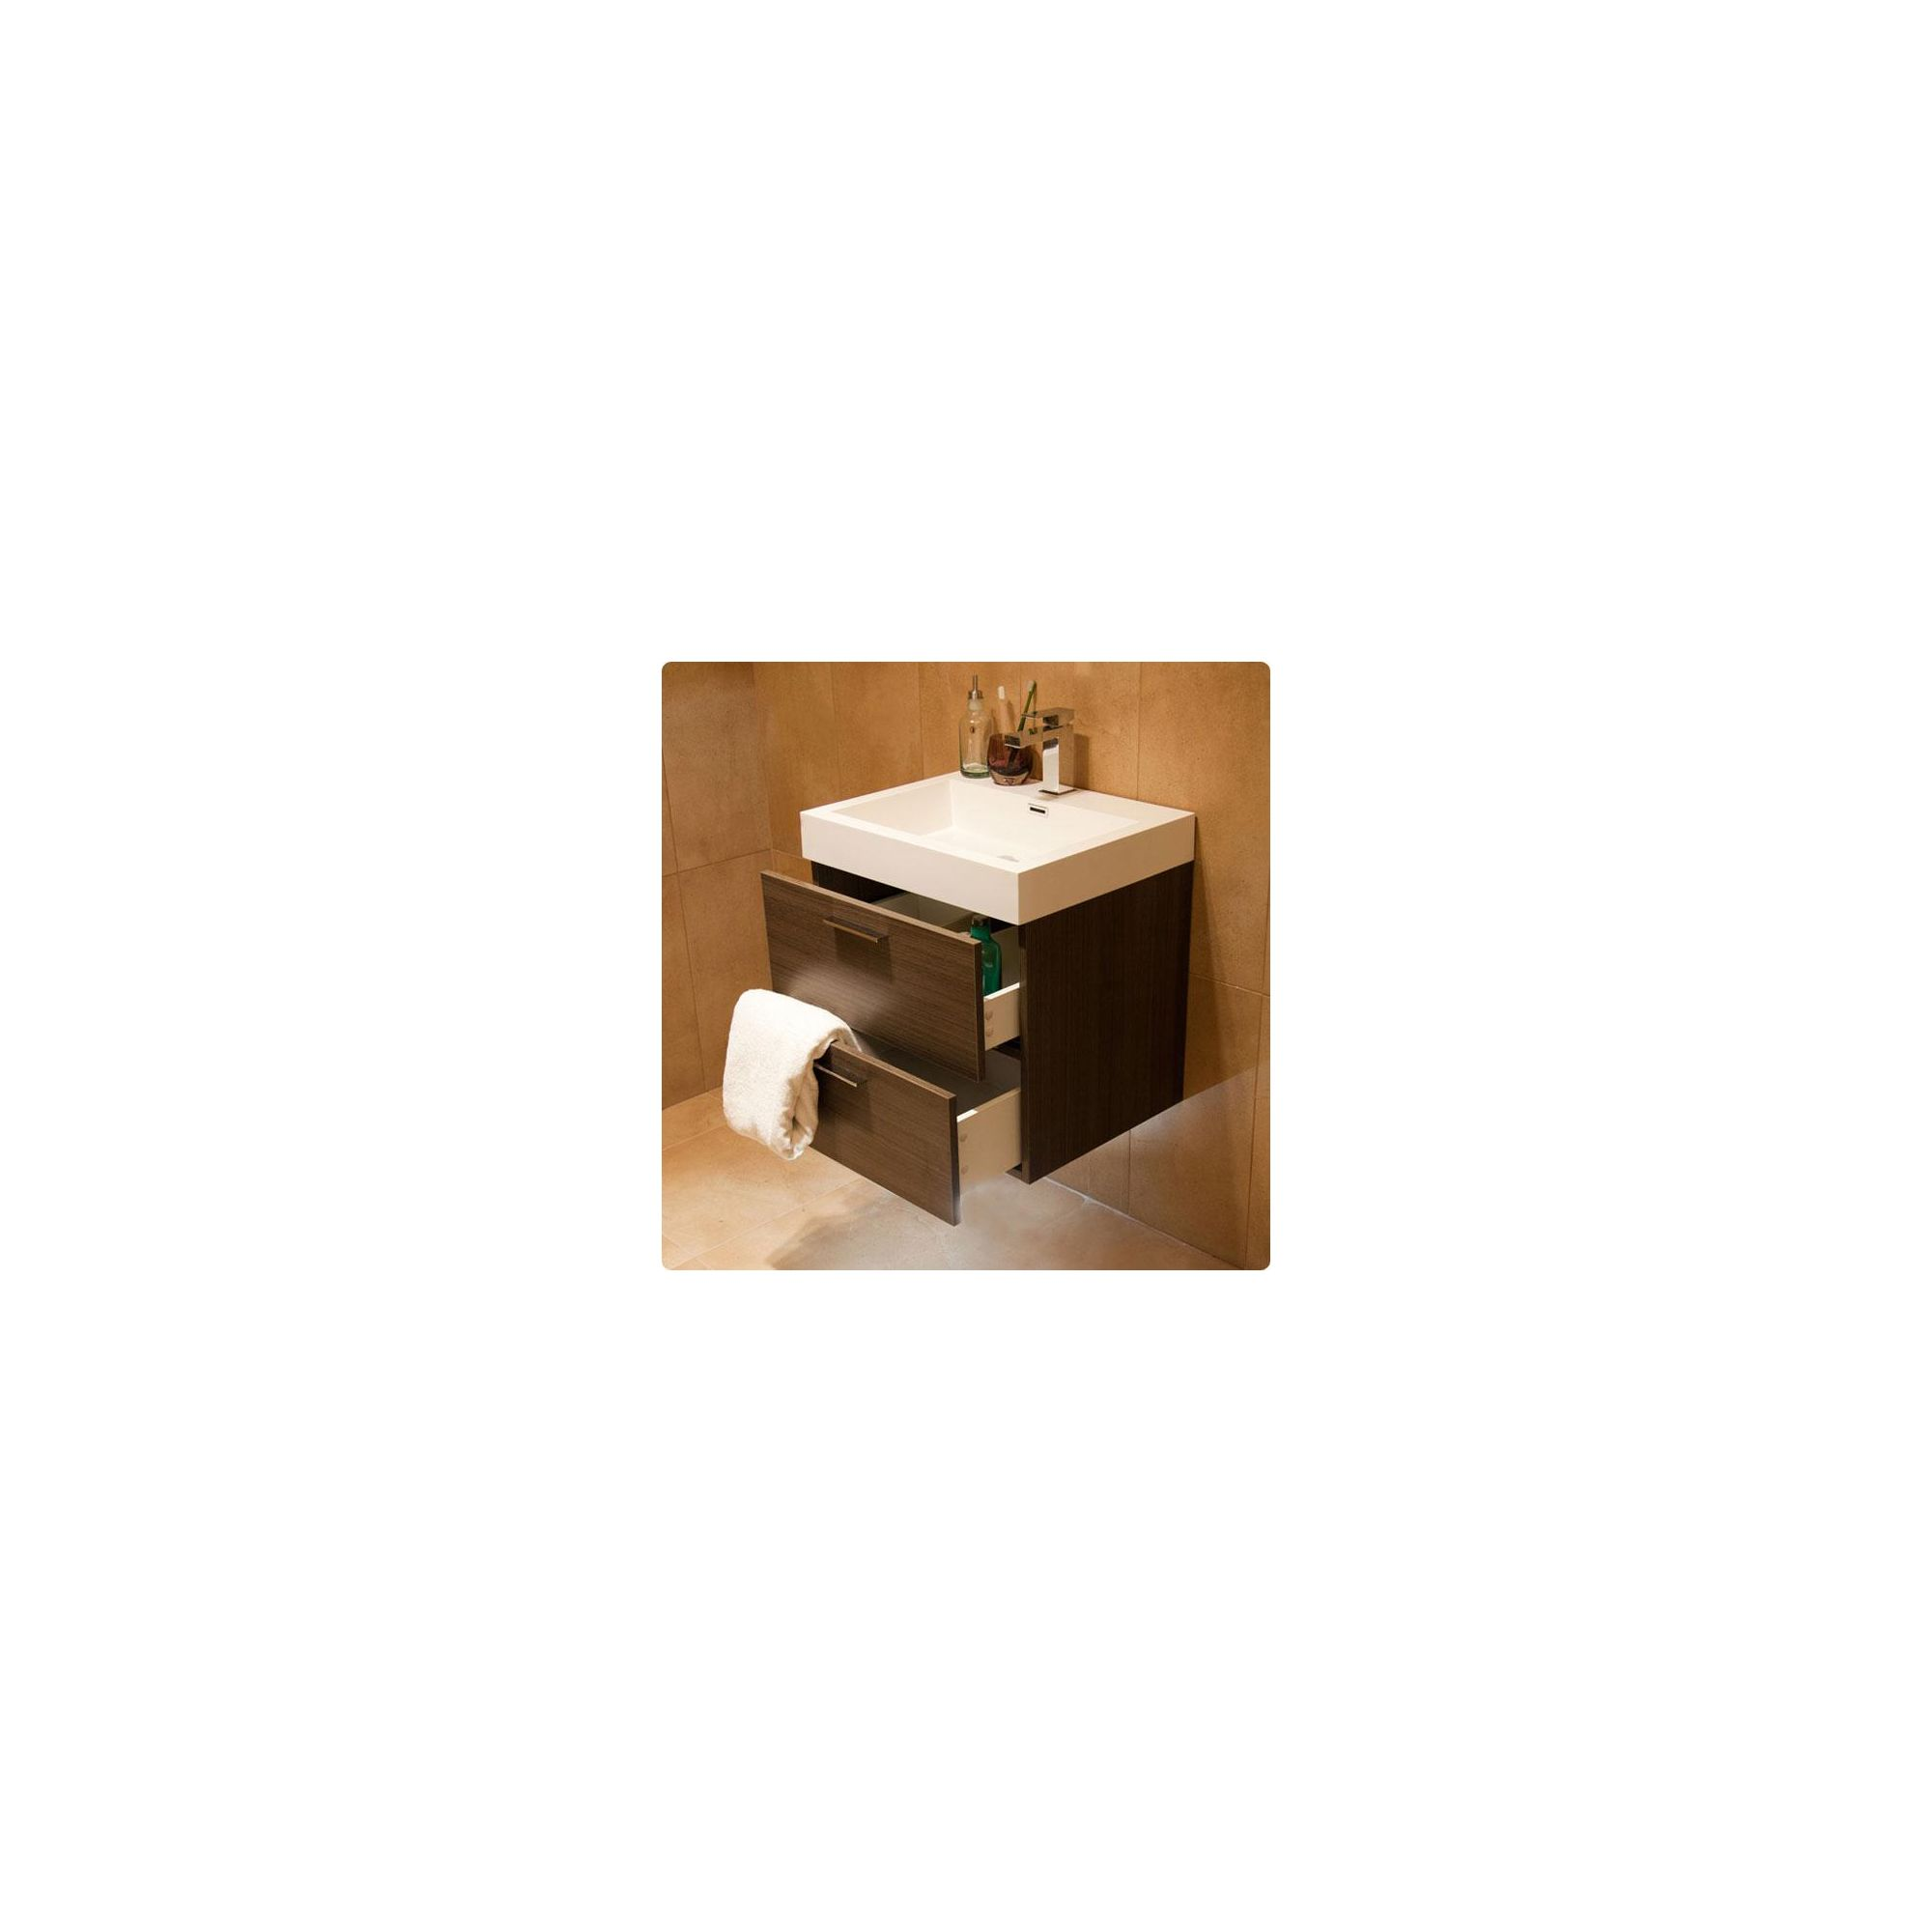 Durab Evolution Bathroom GREY OAK Vanity Unit (Wall Mounted) including Basin 580mm Wide x 468mm Deep